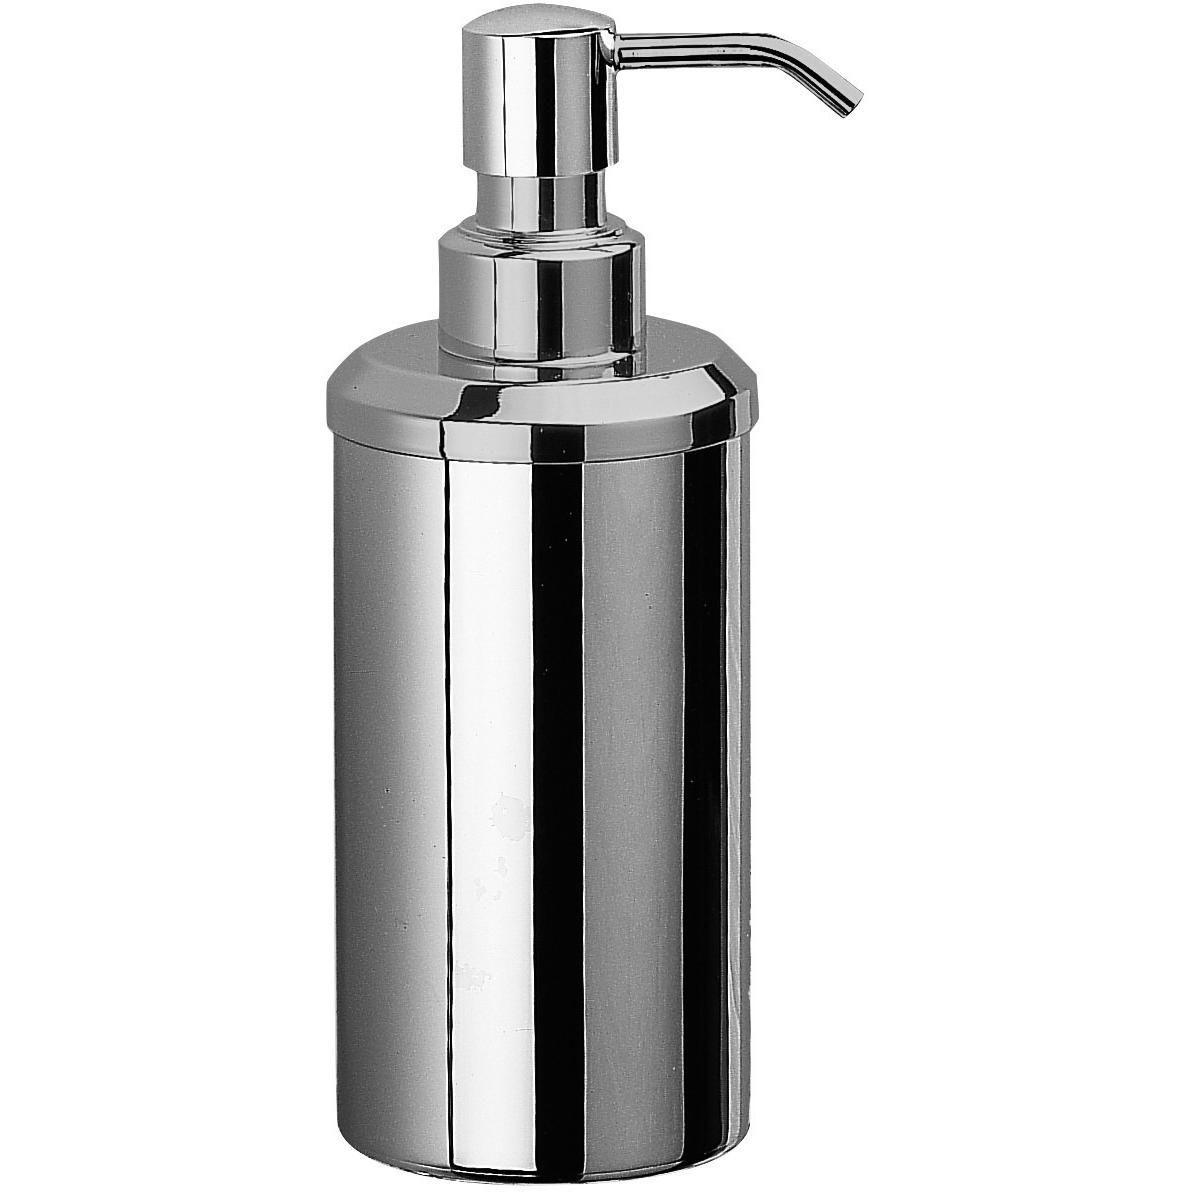 Liquid Soap Dispenser Pump for Bathroom or Kitchen, Brass ...